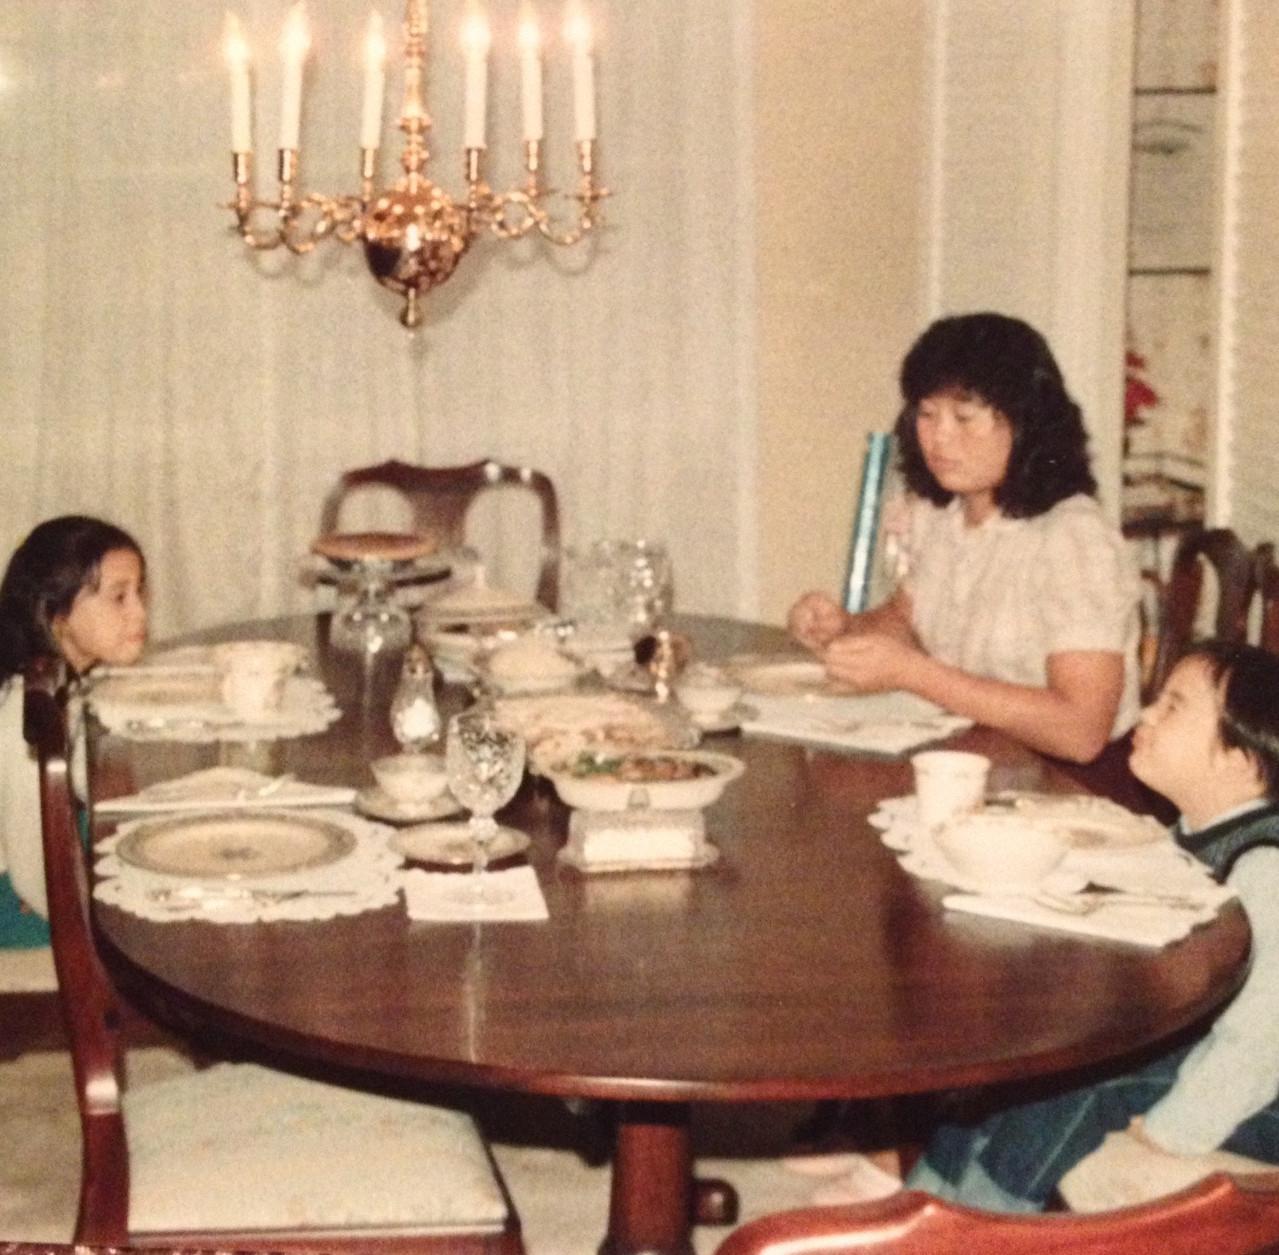 Thanksgiving 1985